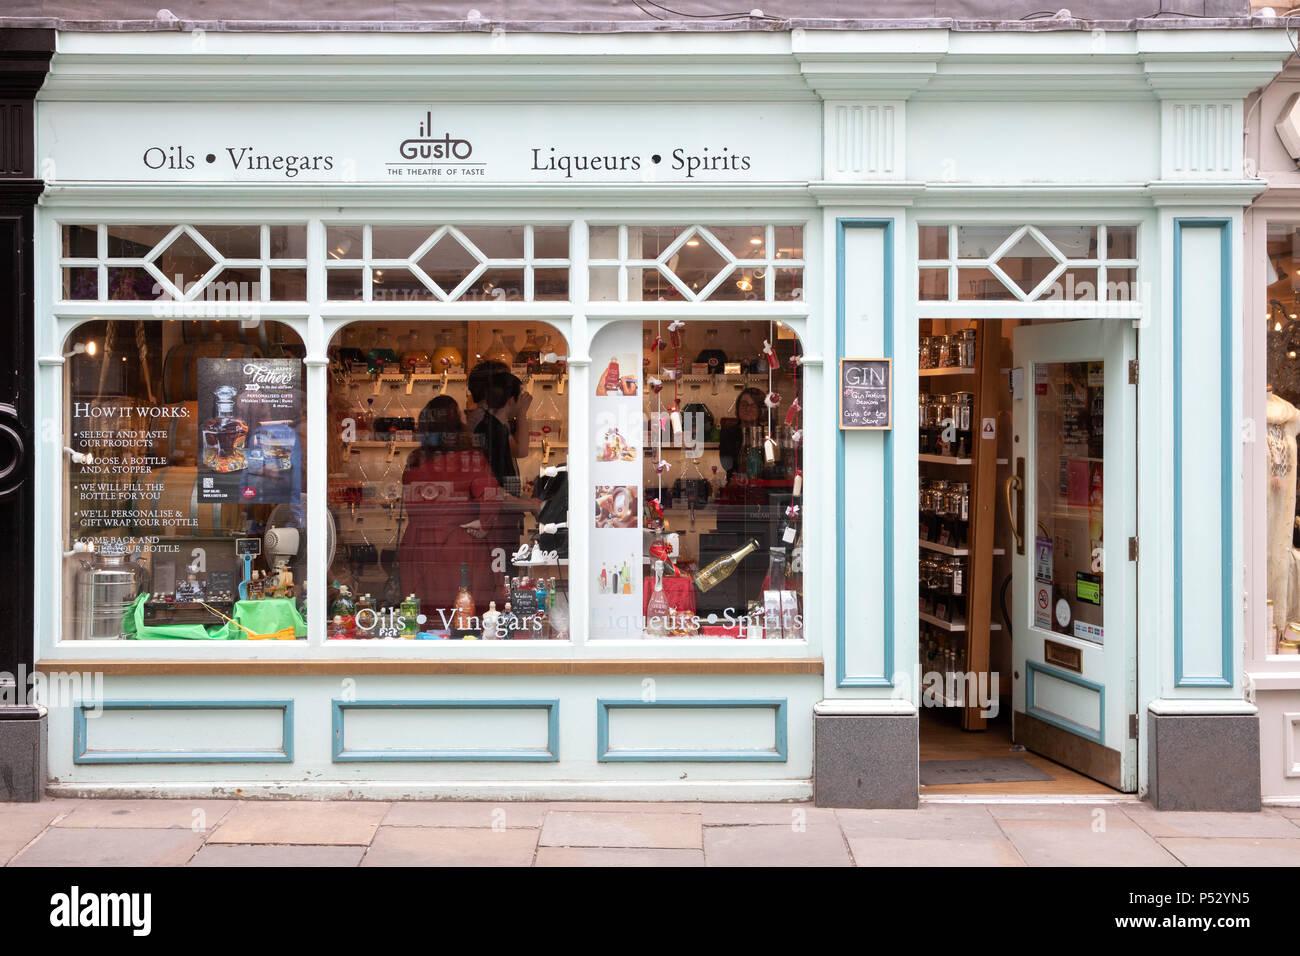 Il Gusto store in York, Großbritannien Stockbild